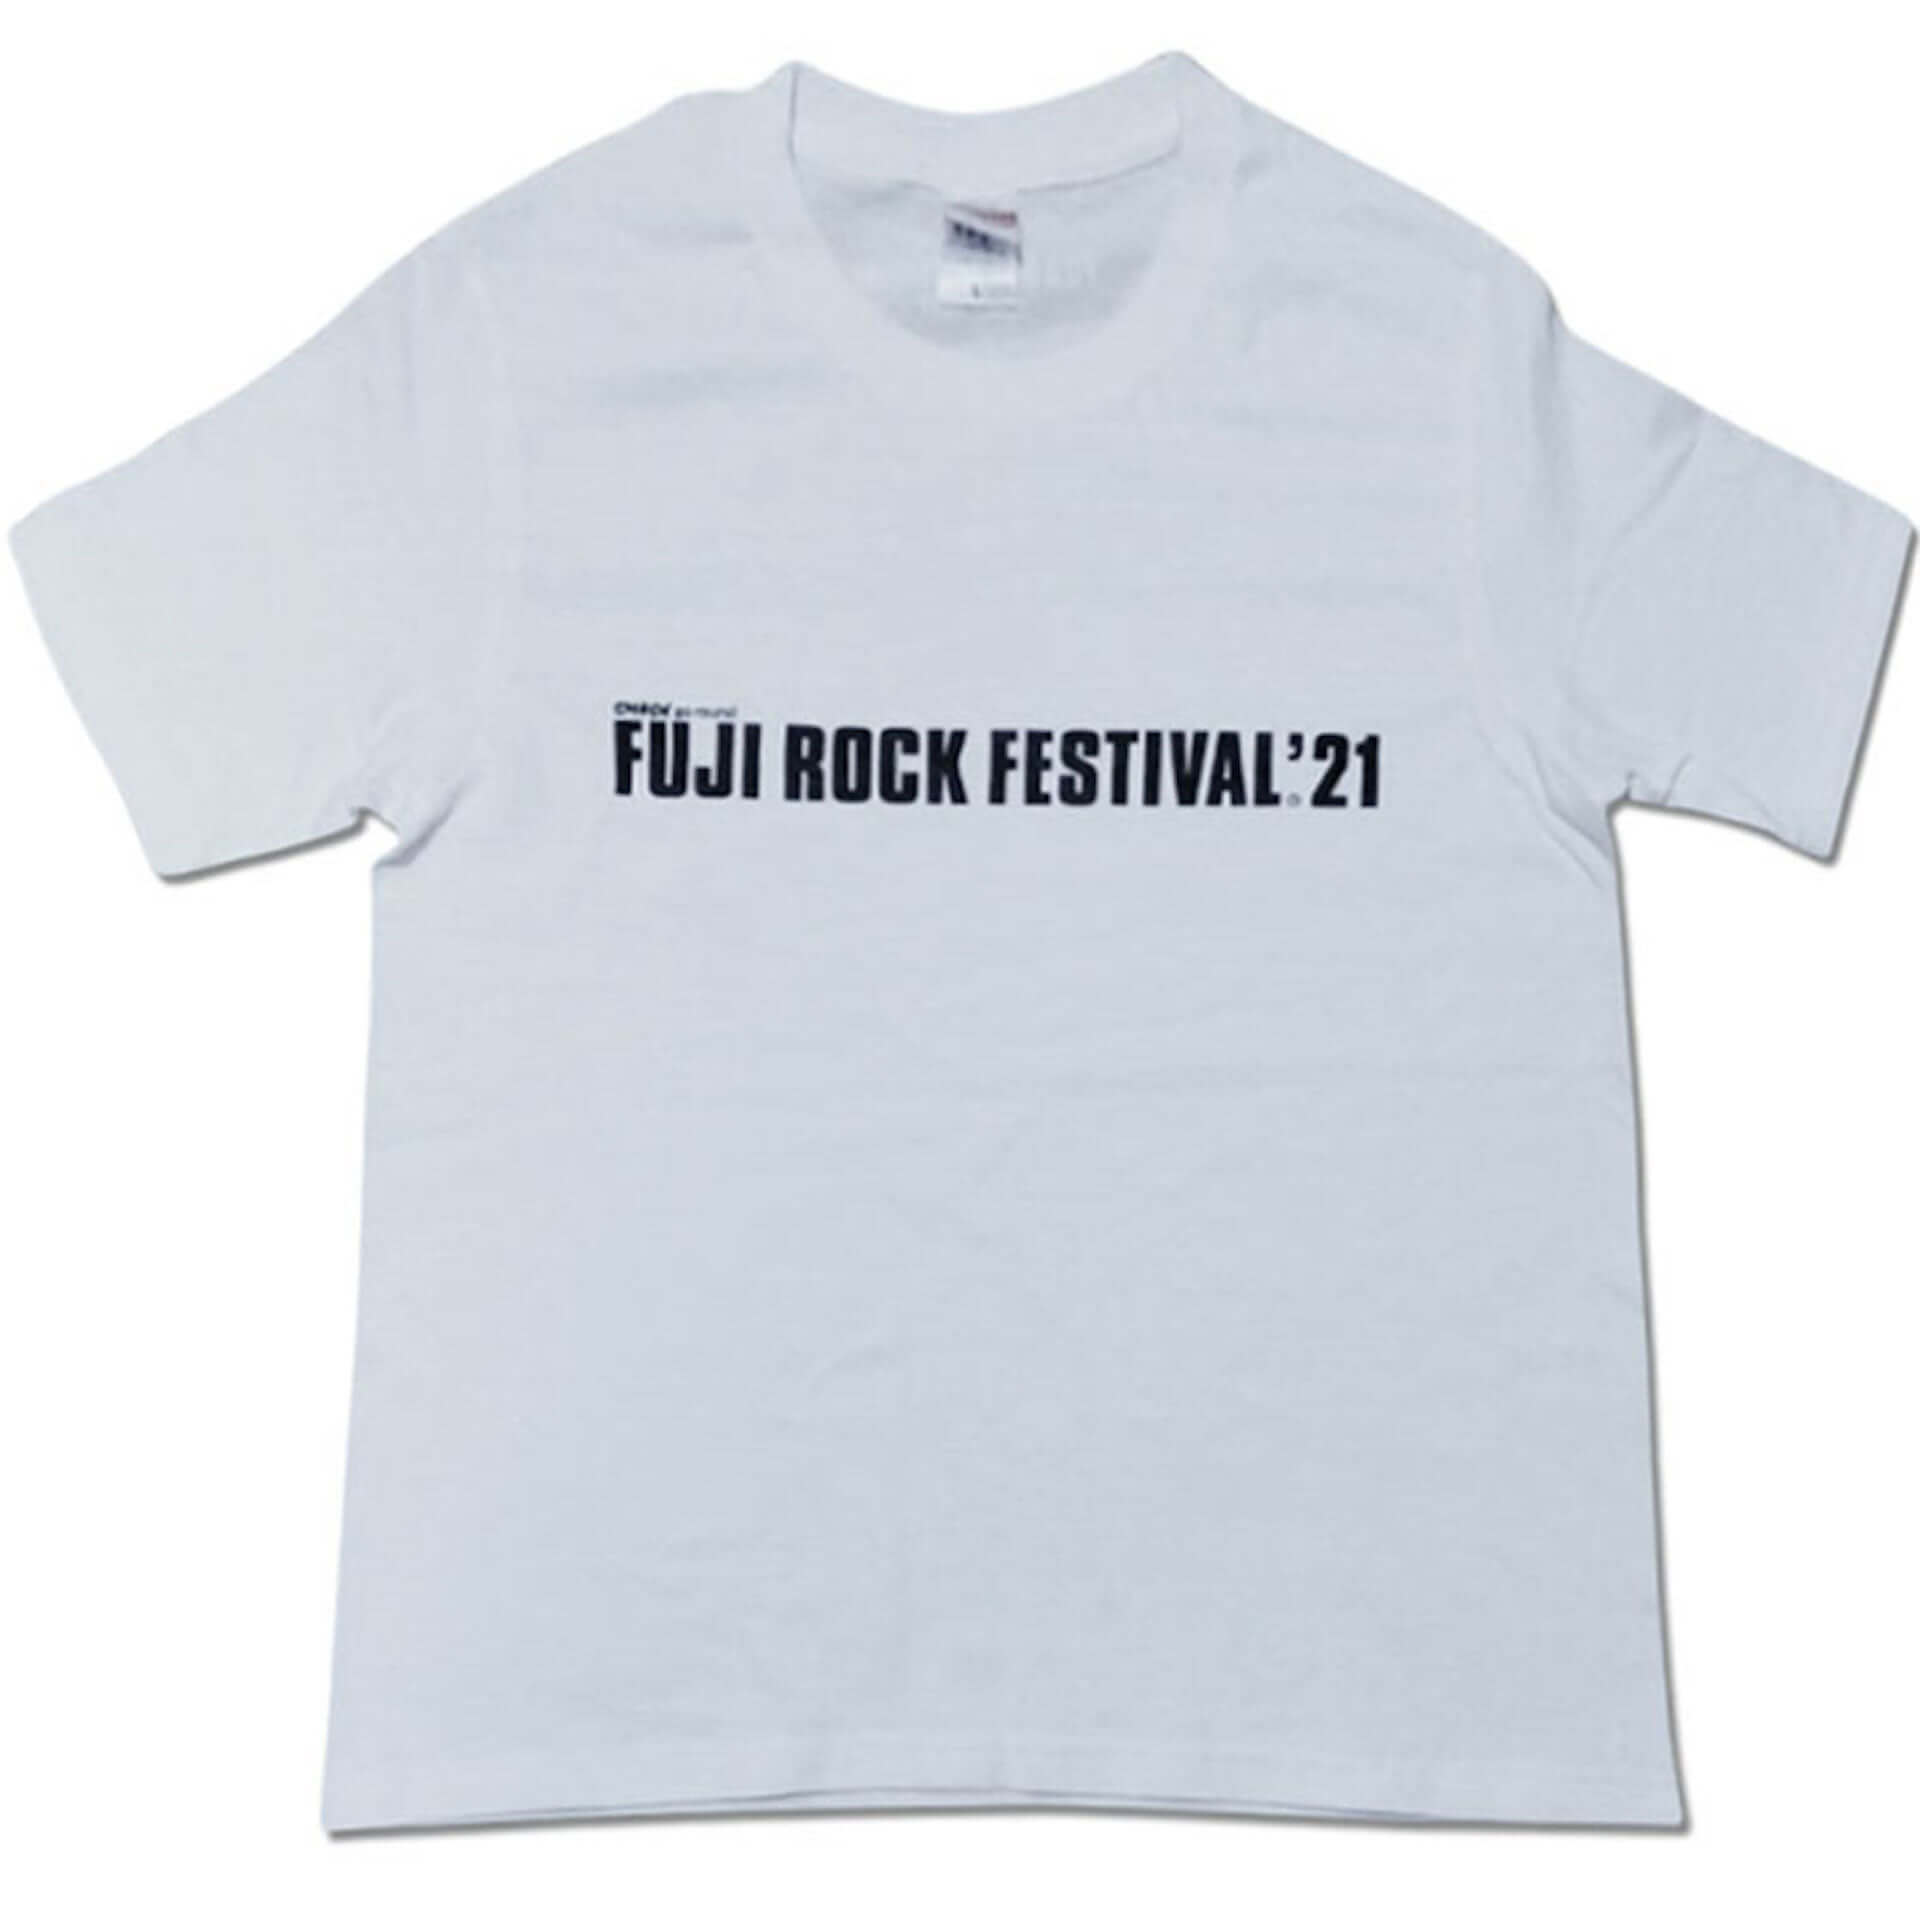 <FUJI ROCK FESTIVAL>公式グッズの新作が登場!大晦日イベント<KEEP ON FUJI ROCKIN' II>のチケットも明日発売 musicf201211_frf_16-1920x1920